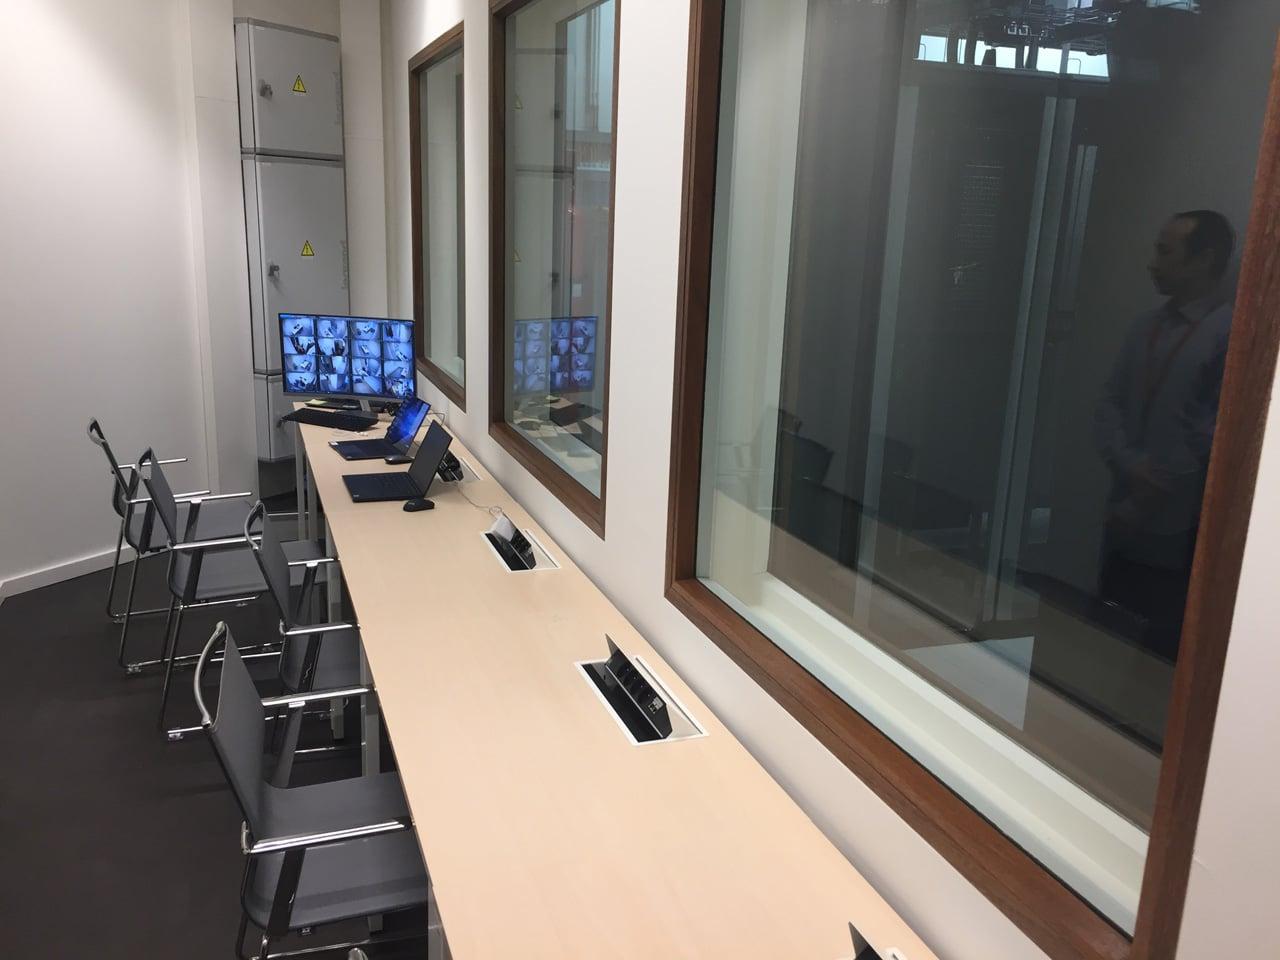 Huawei Cyber Security Transparency Centre v Bruselu